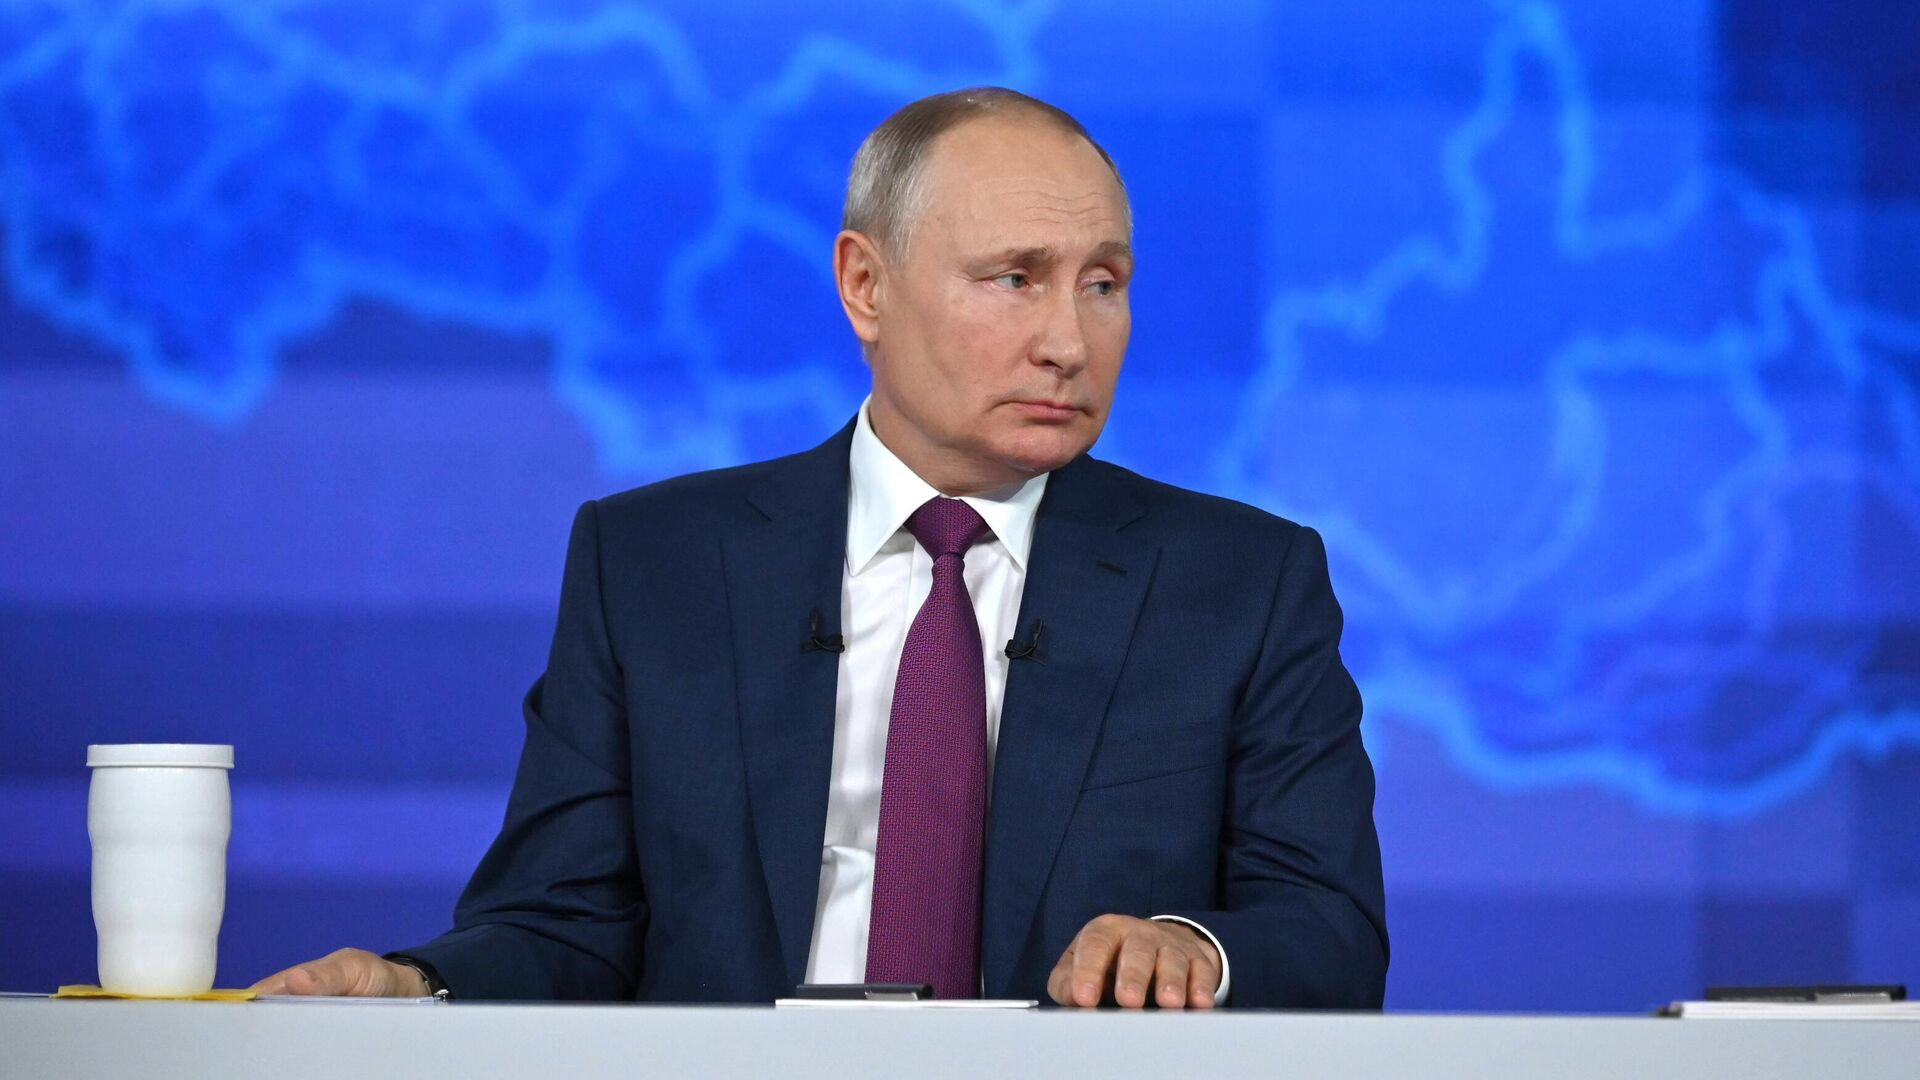 Línea directa con Vladímir Putin 2021 - Sputnik Mundo, 1920, 17.09.2021